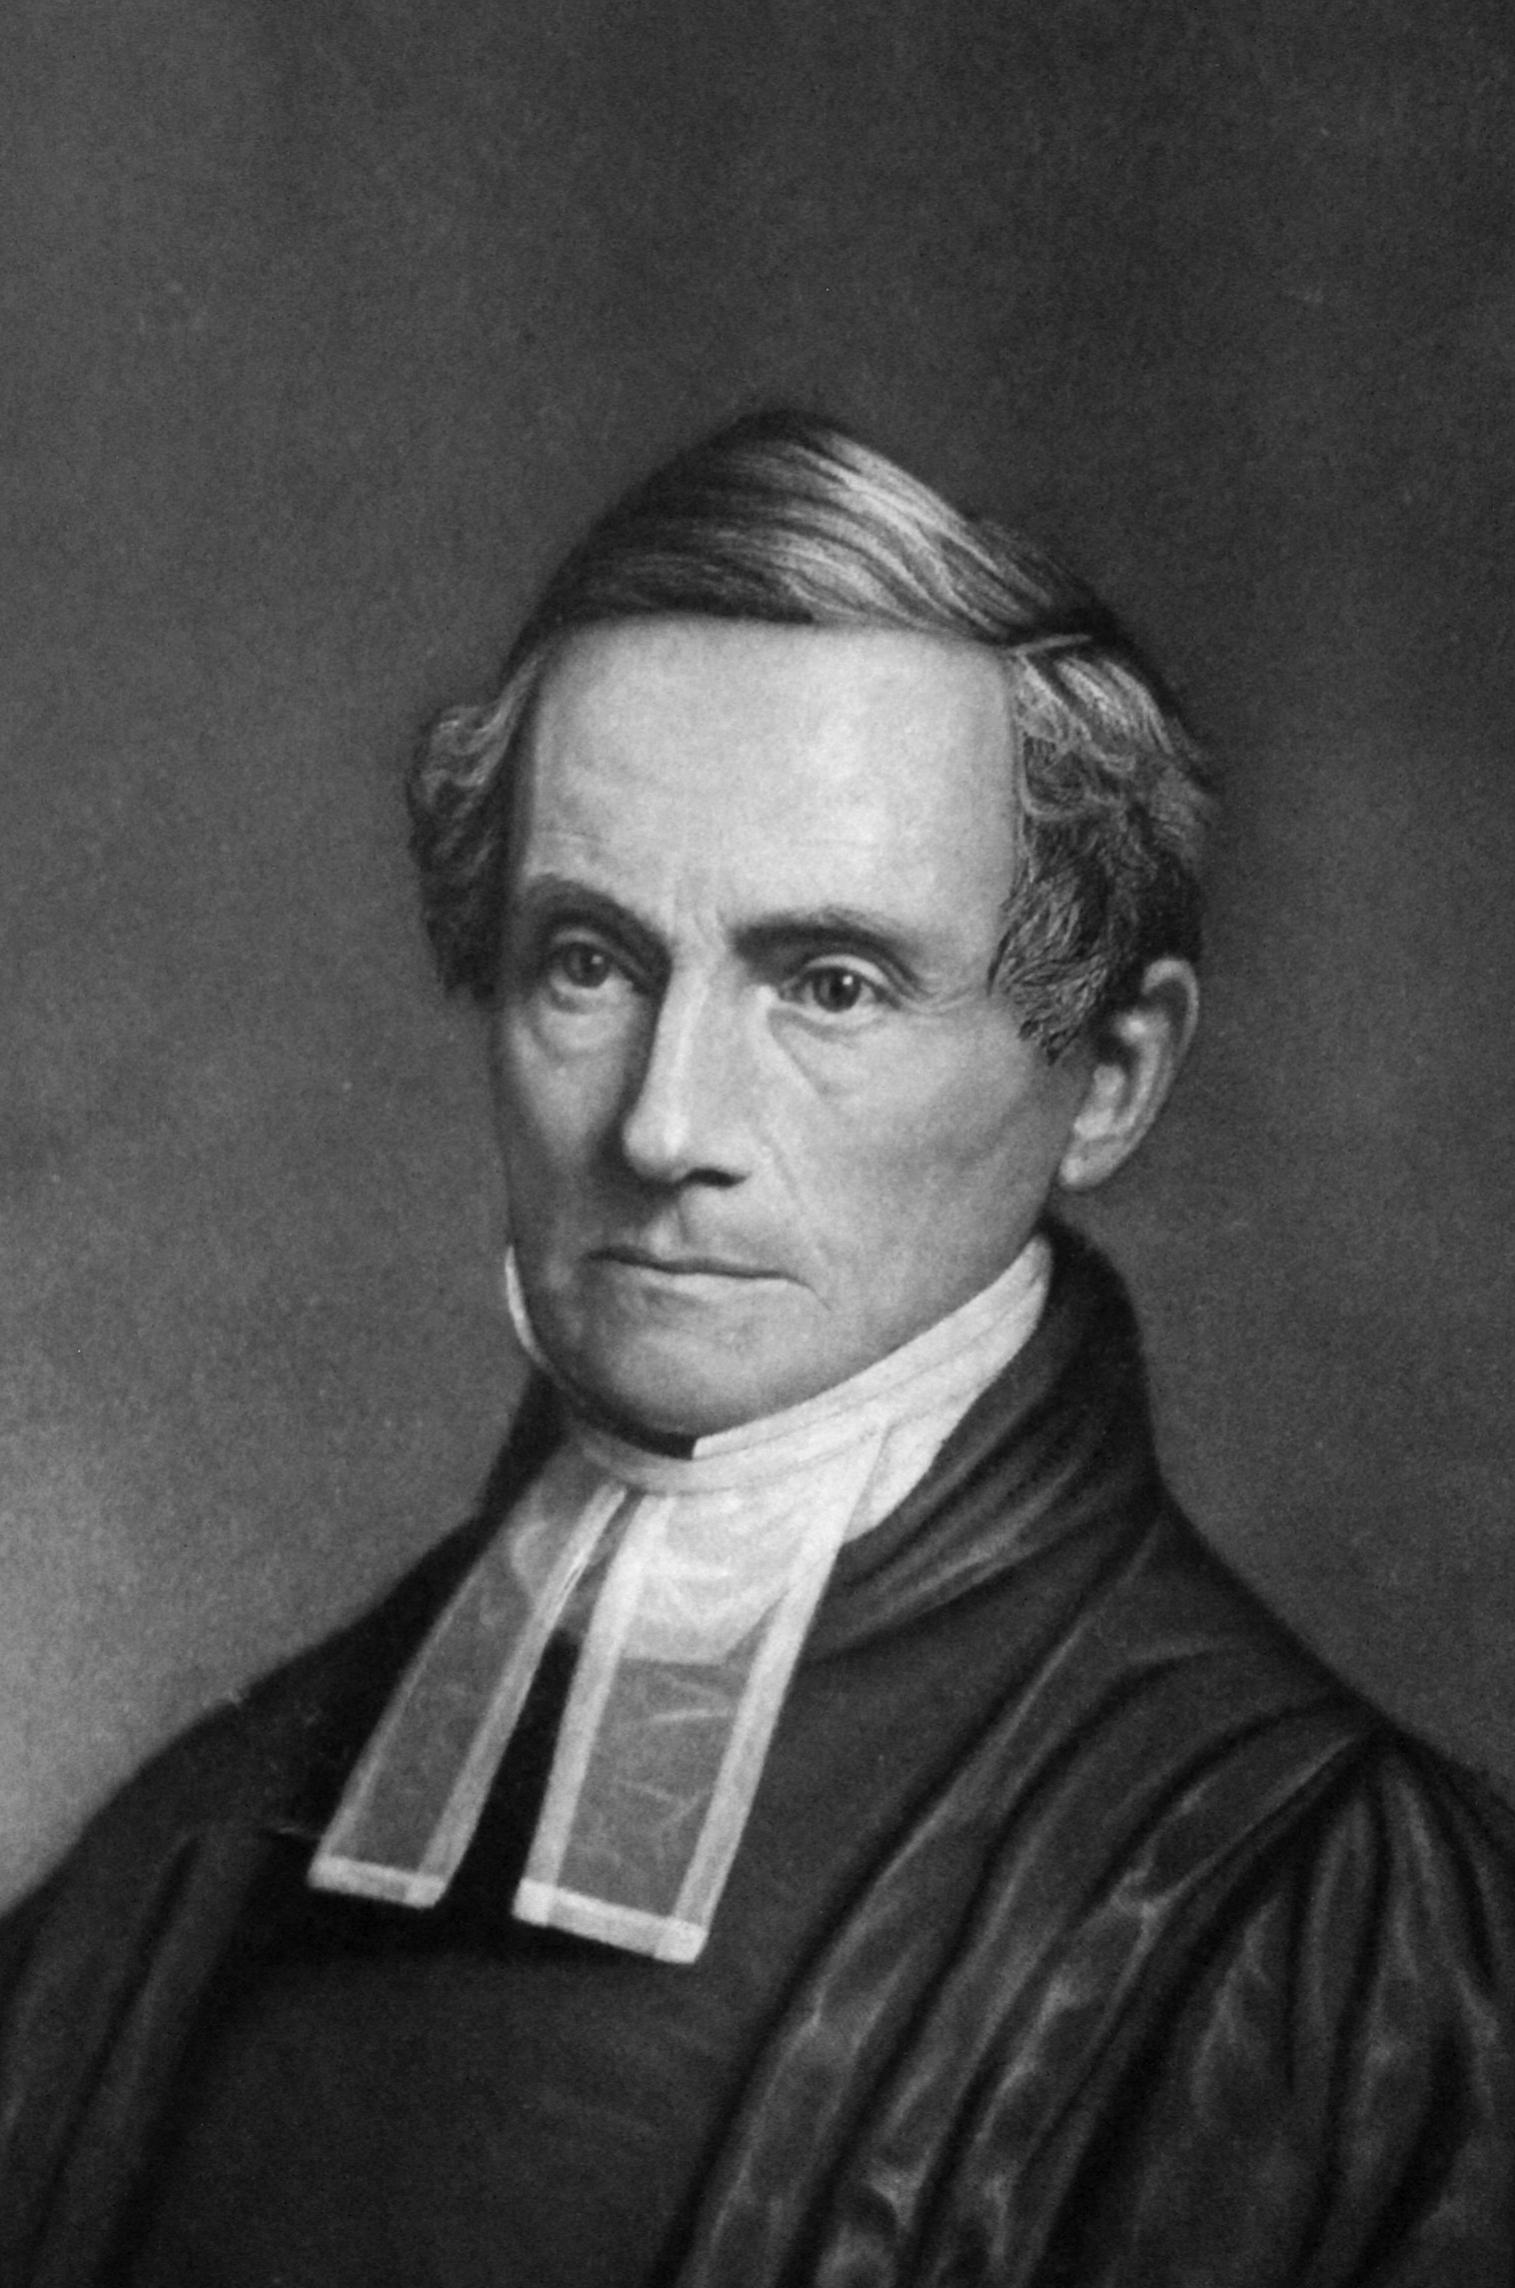 Rev. Benjamin Dorr, engraving from daguerreotype.Courtesy of the Carson family. Photo by Mark F. Knapp.